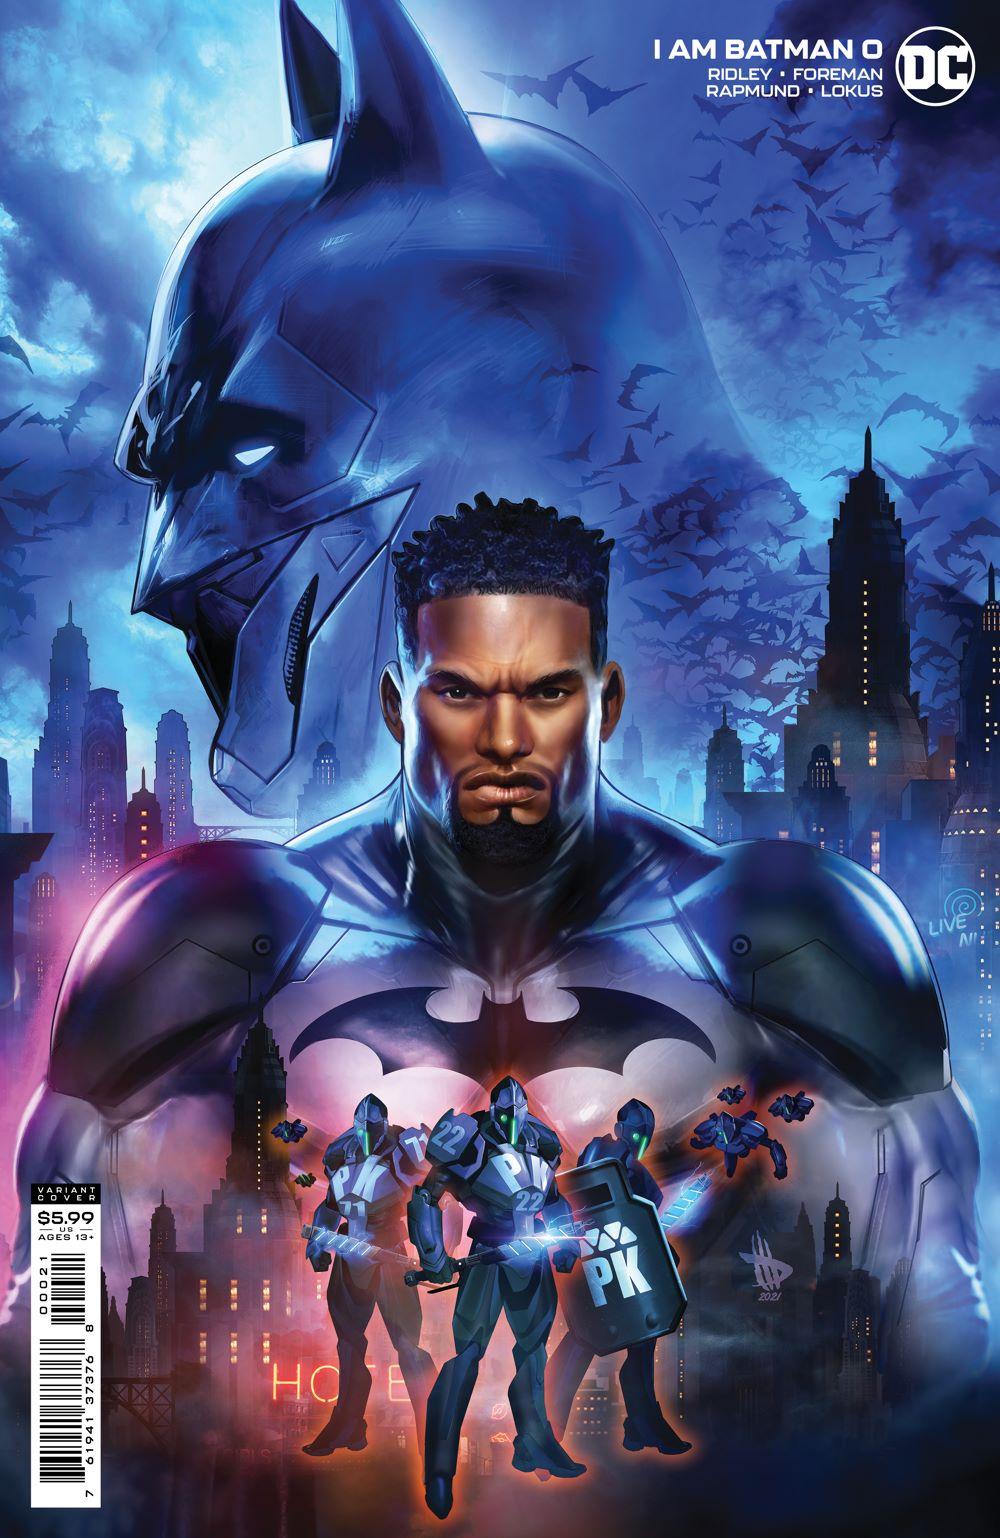 IAMBM_Cv0_var_00021 DC Comics August 2021 Solicitations